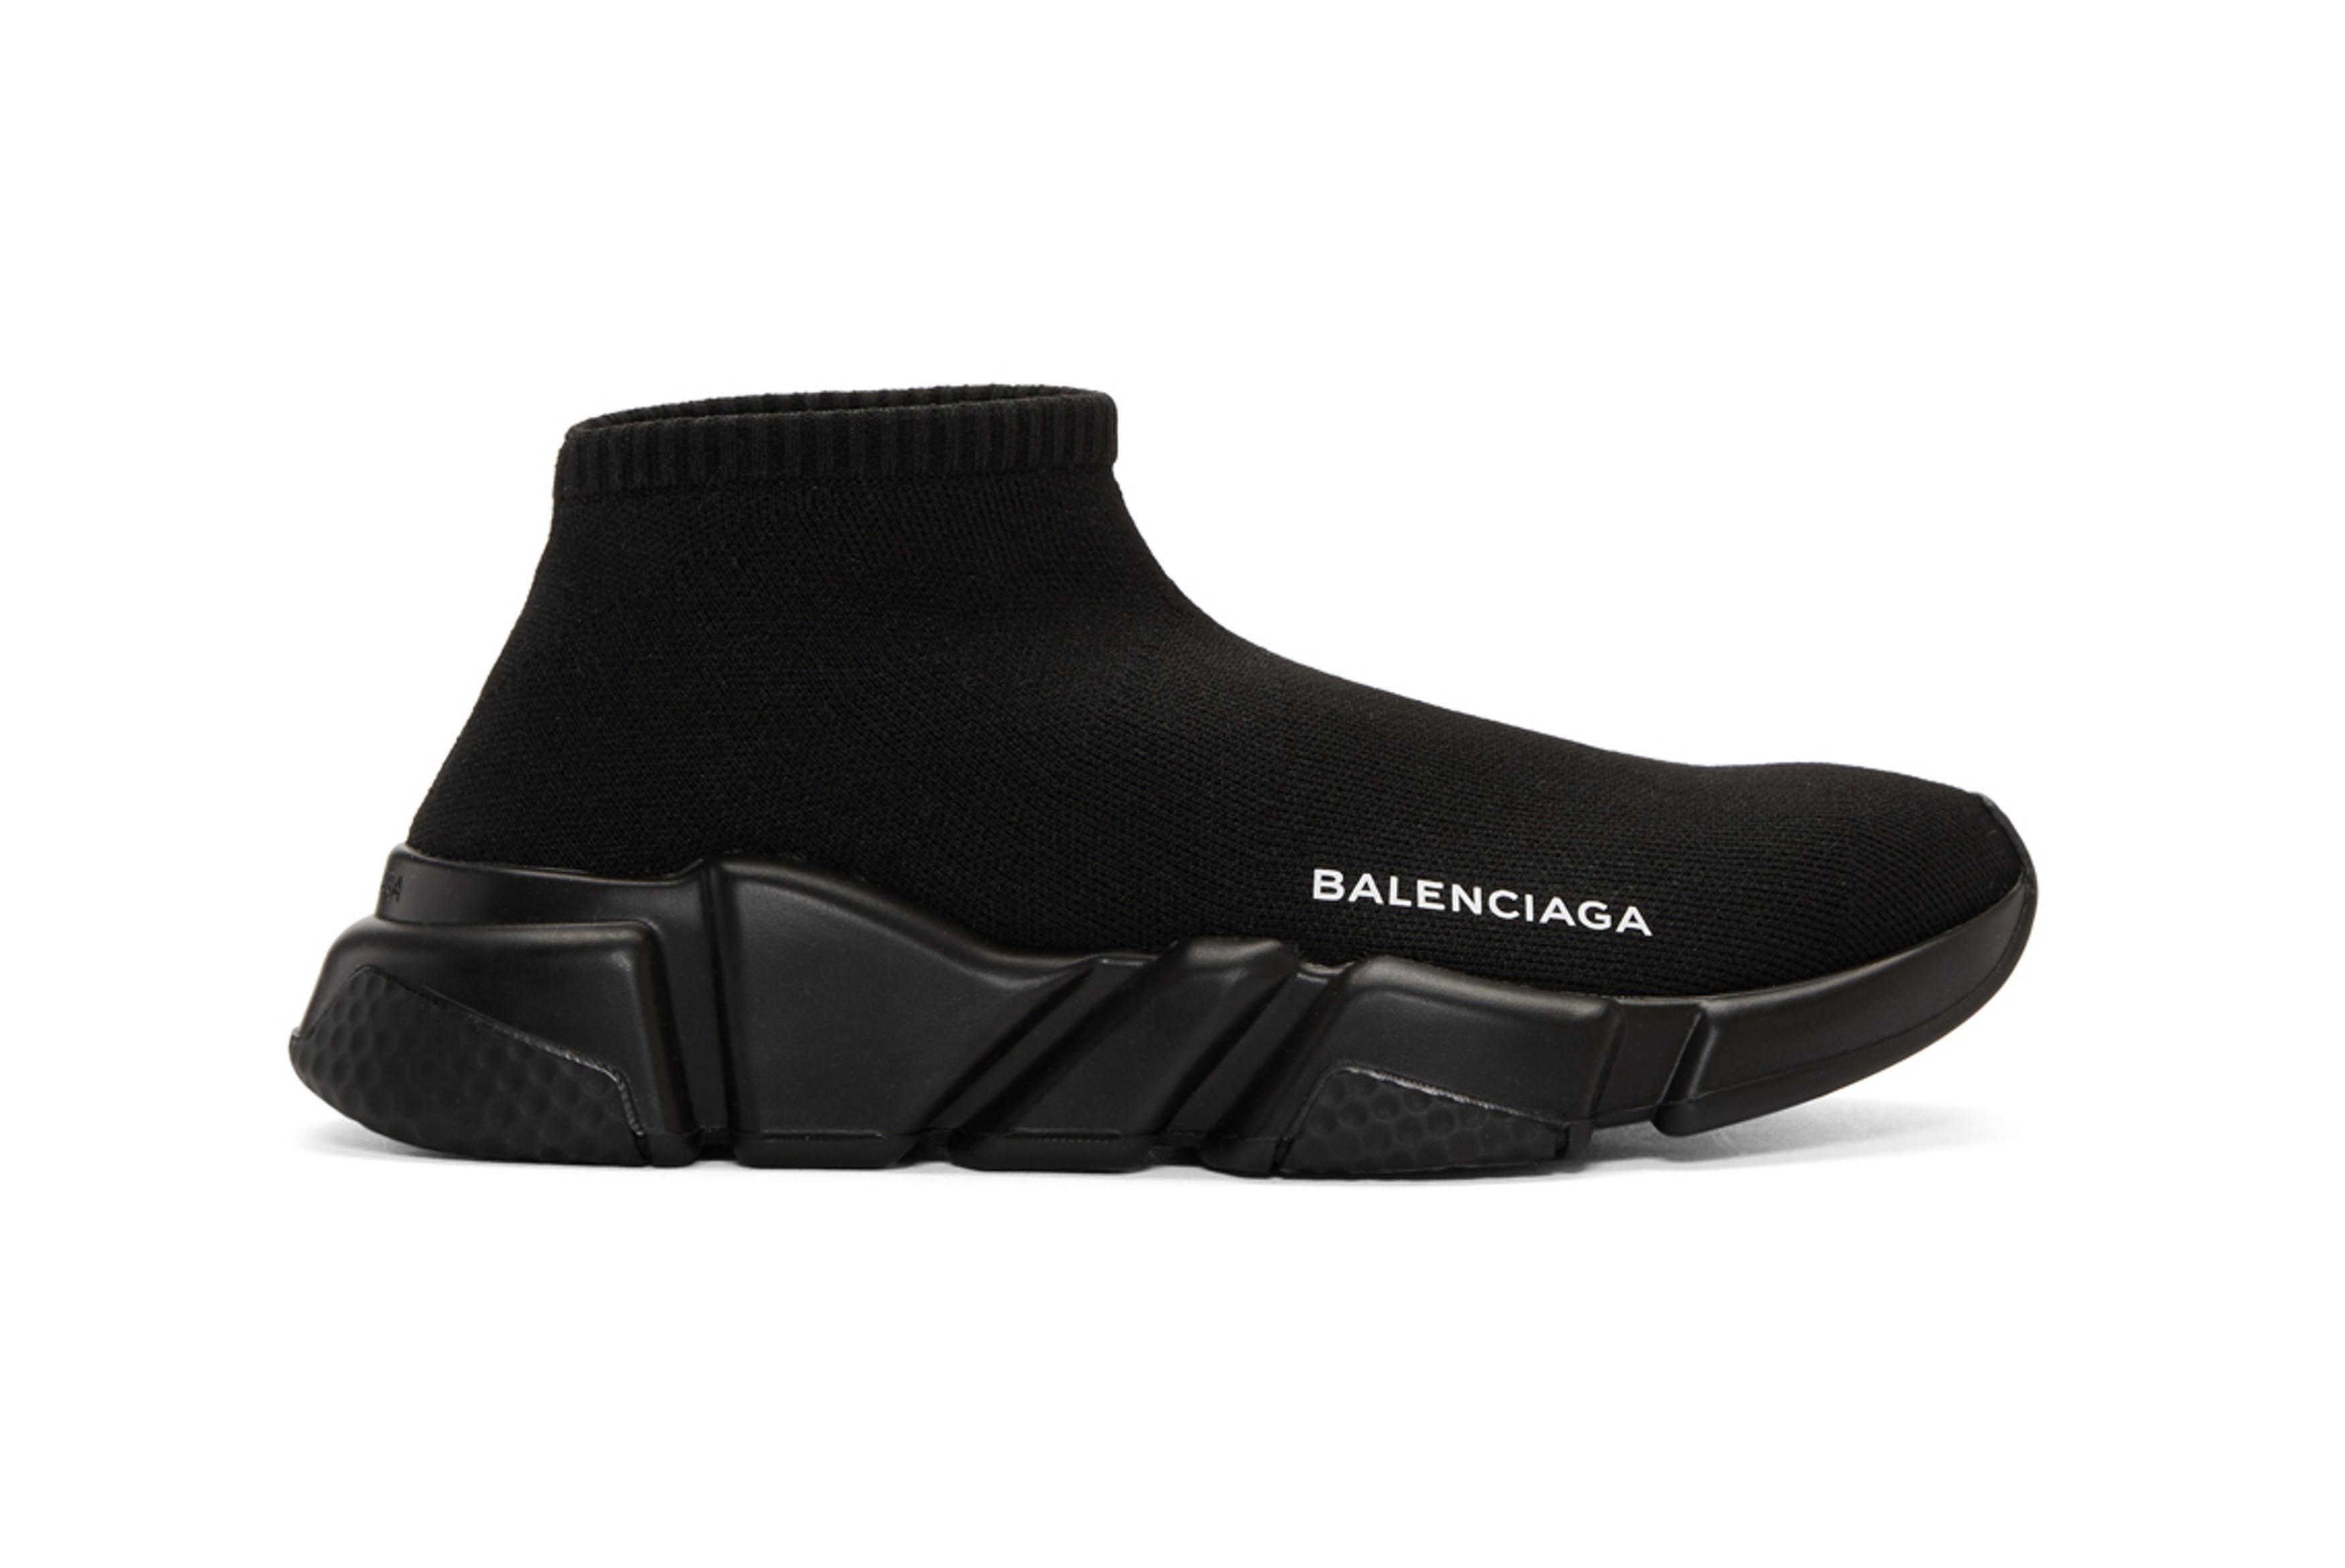 Balenciaga Speed Low High Top Sneakers Black Navy 1 Sneaker Freaker